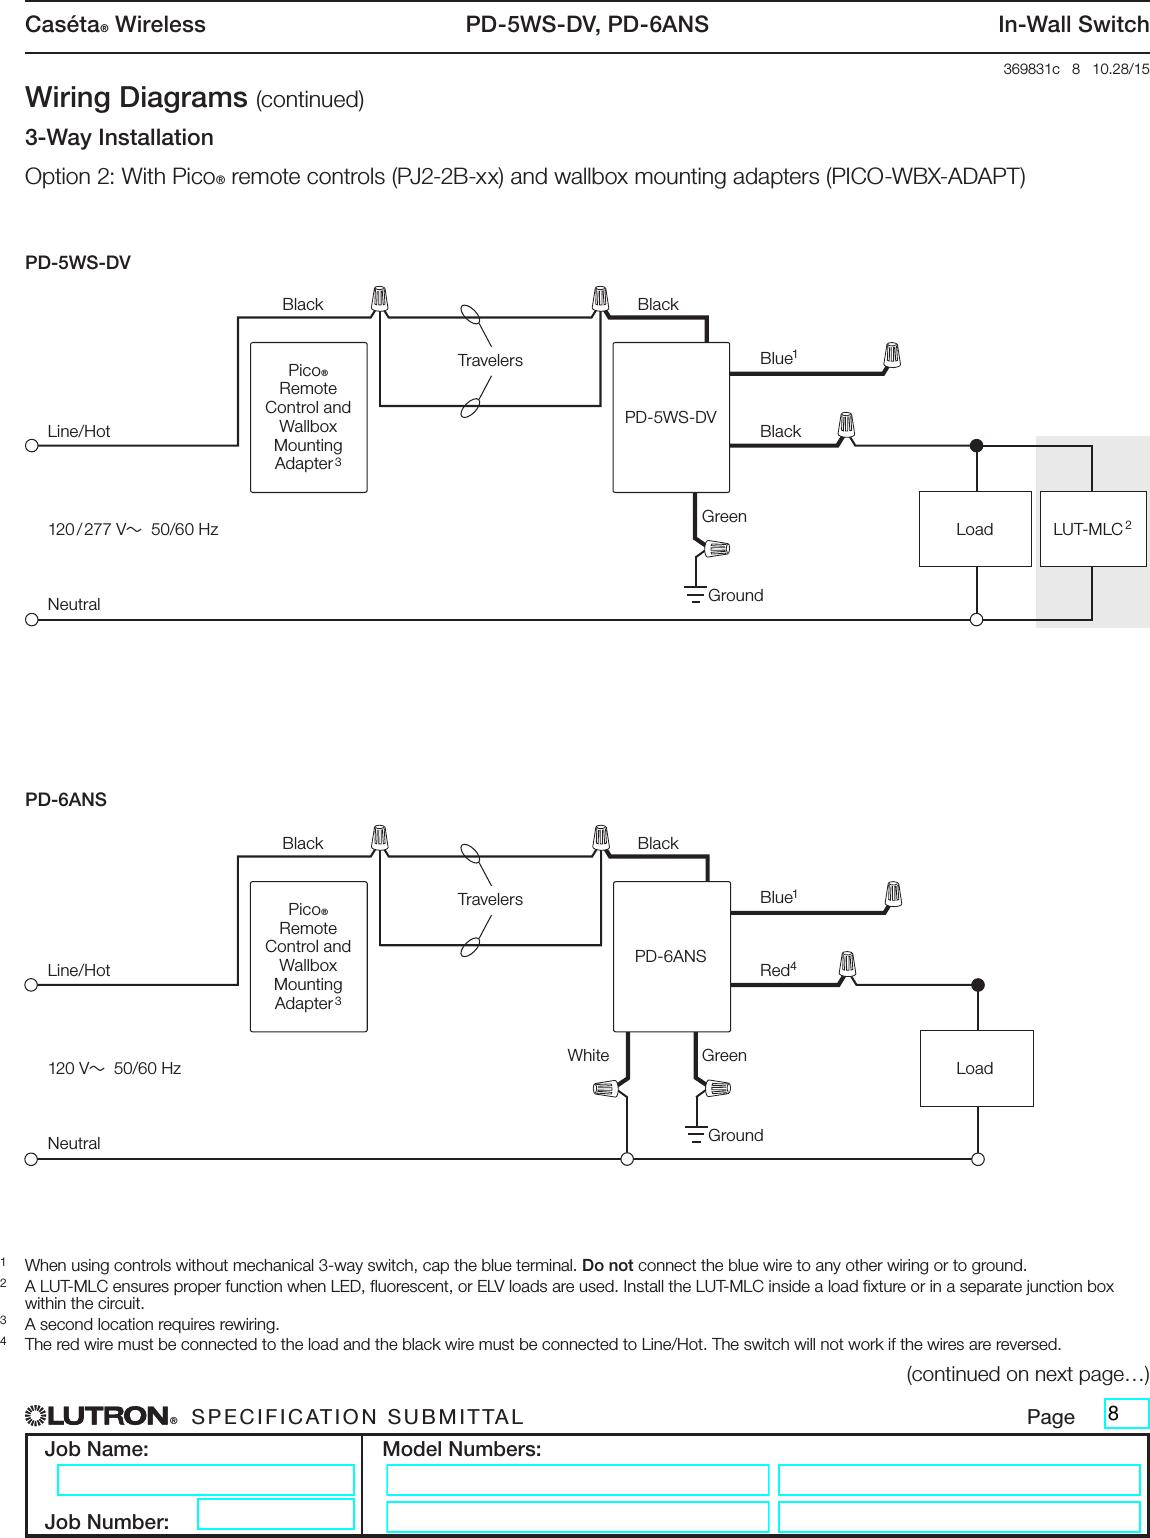 Lut Mlc Lutron Wiring Diagram. . Wiring Diagram Harmony Guitars Electric Wiring Diagram on